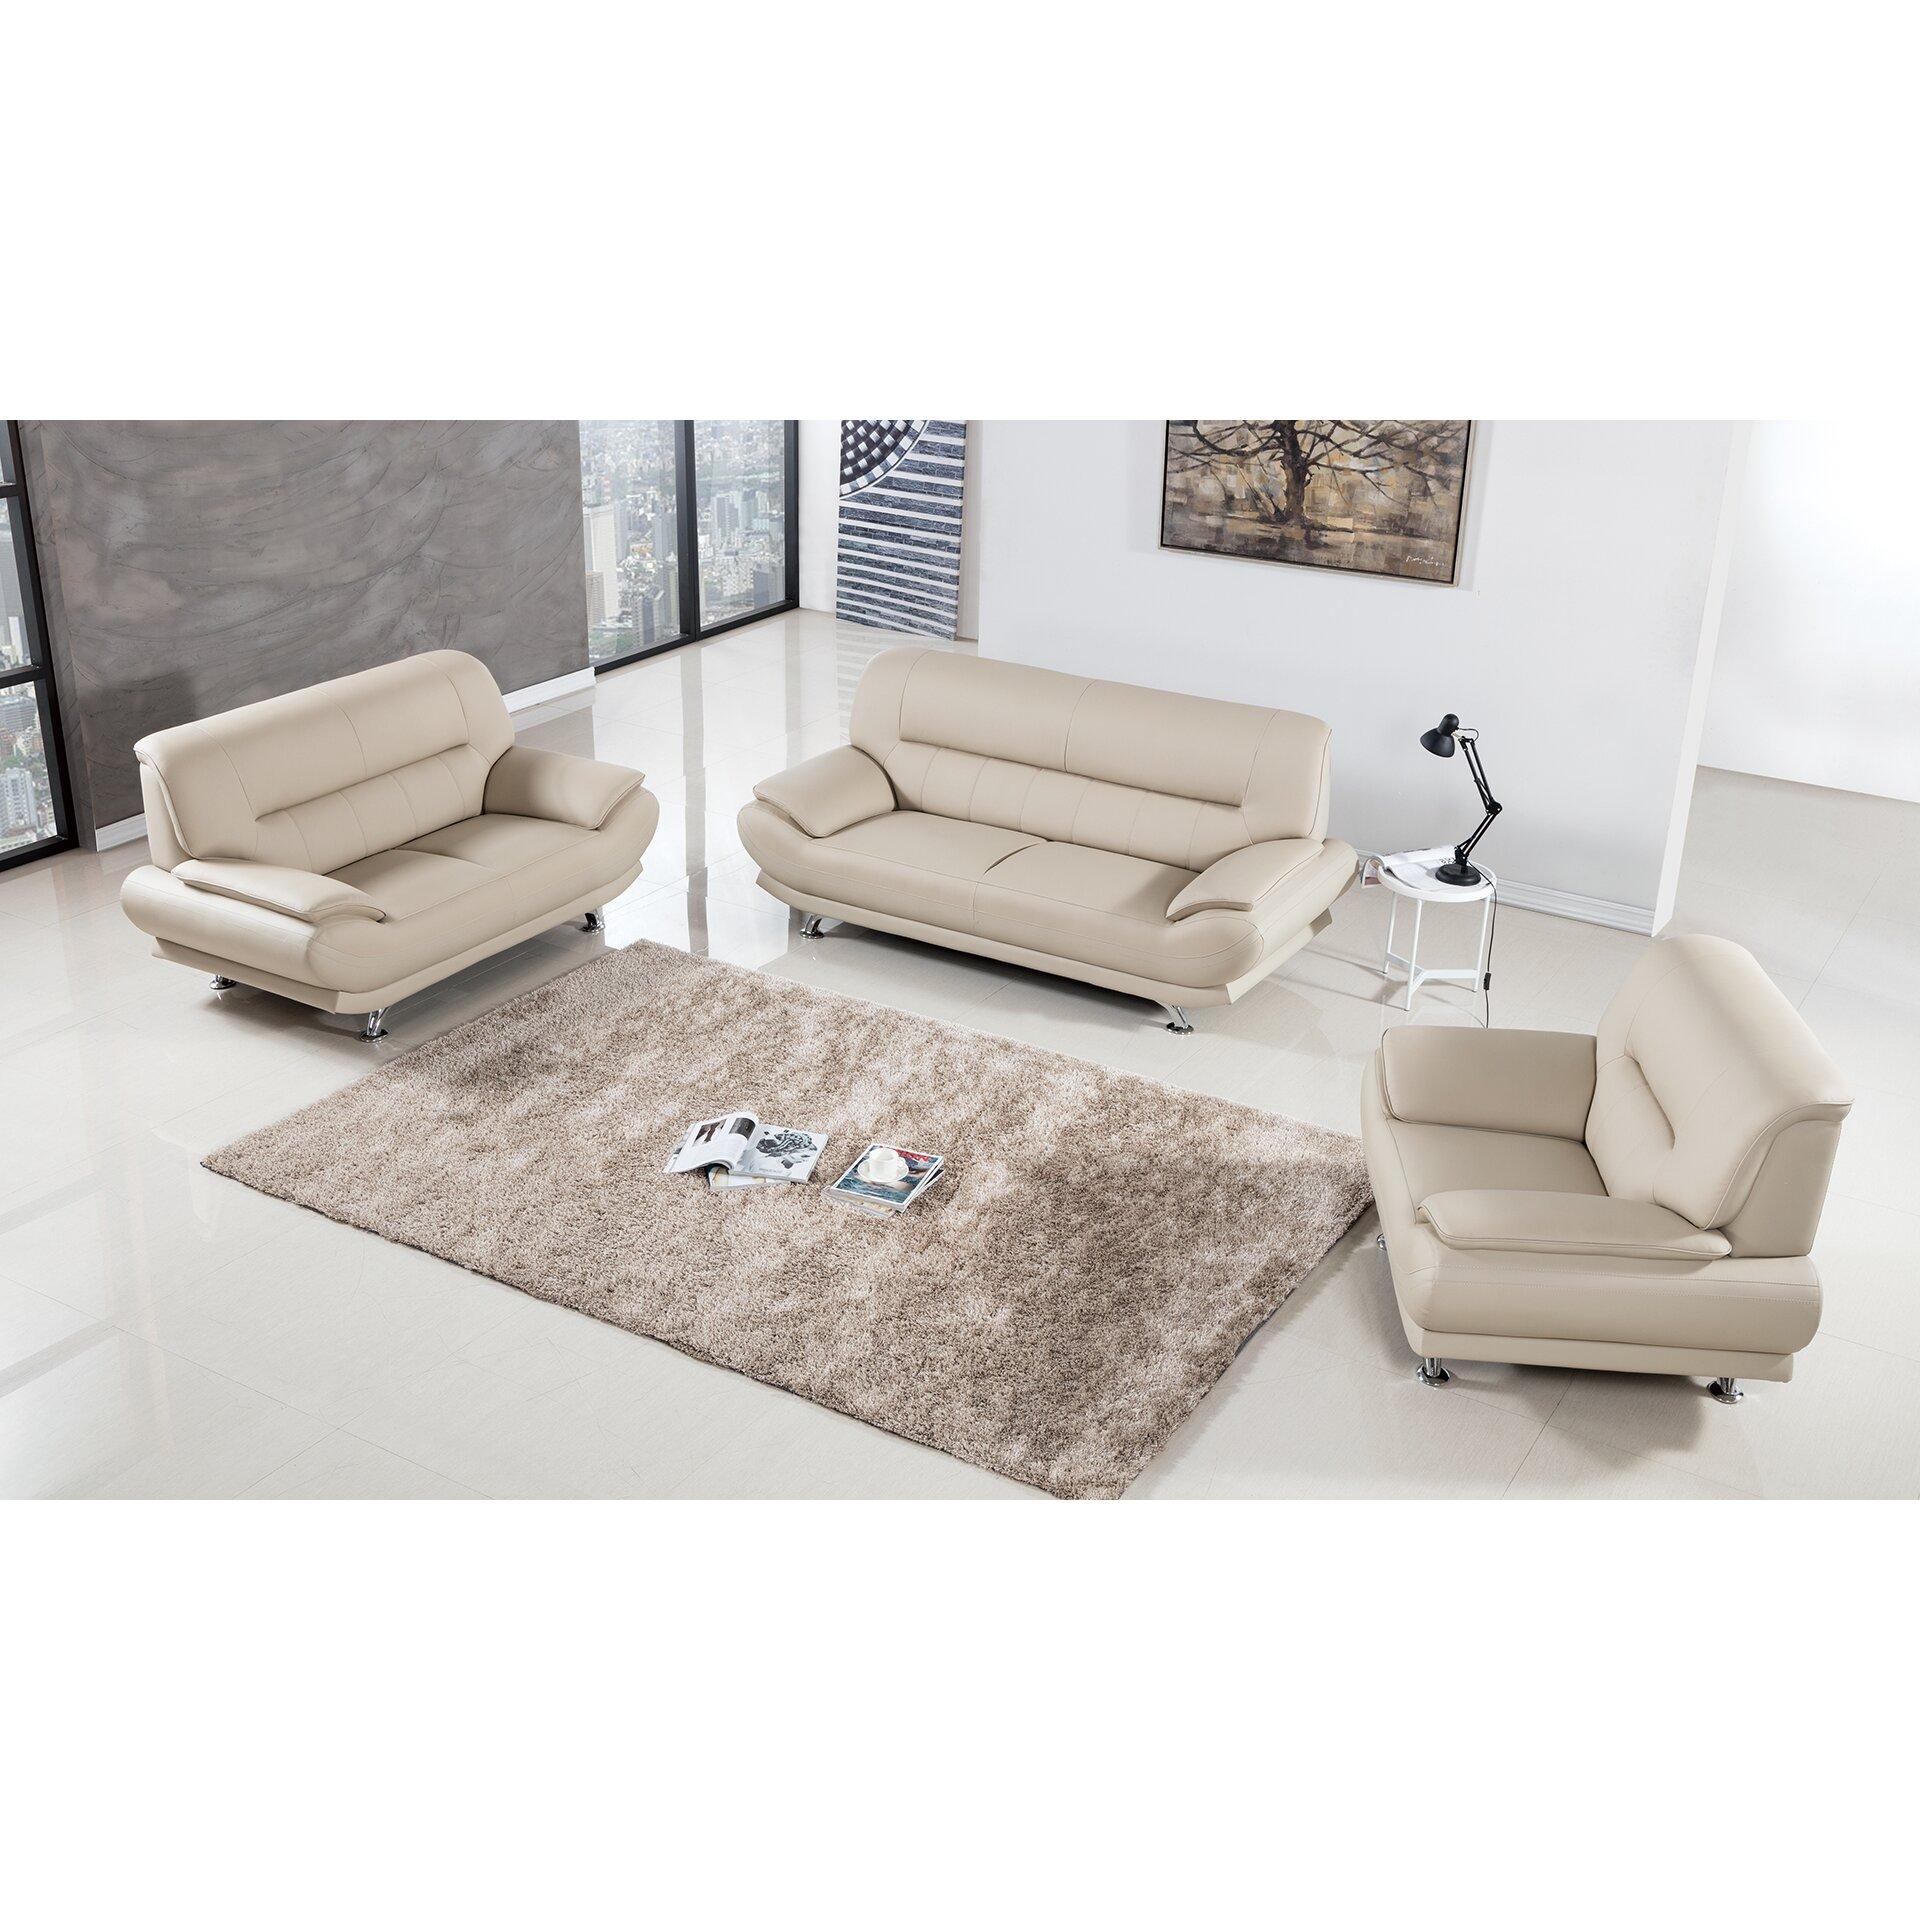 mason 3 piece living room set & reviews | allmodern